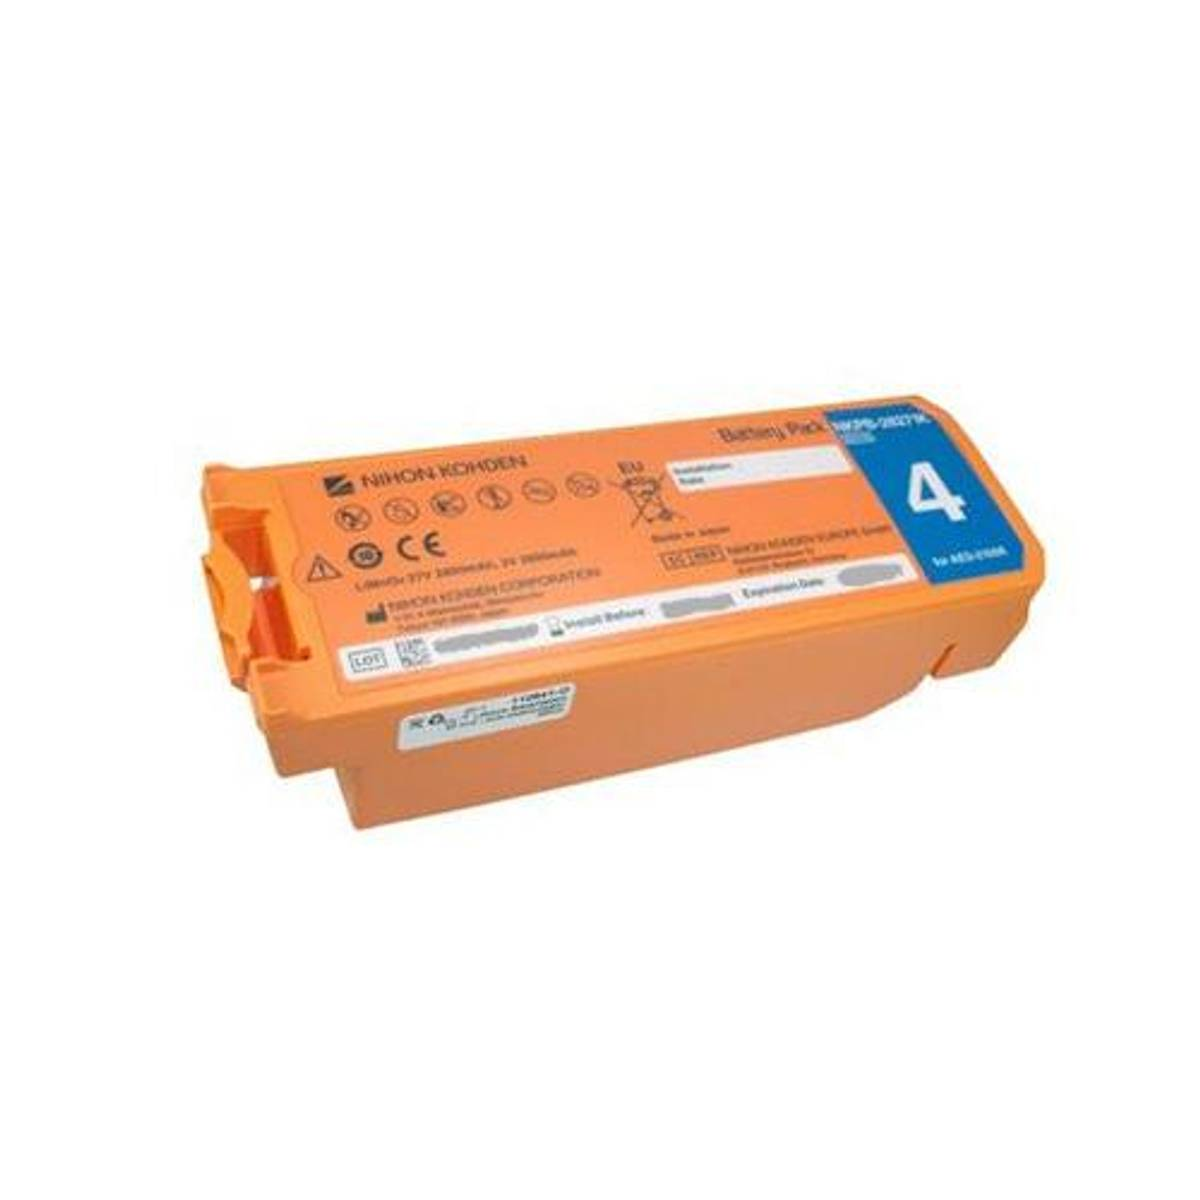 Nihon Kohden Cardiolife AED batteri 2100 serien